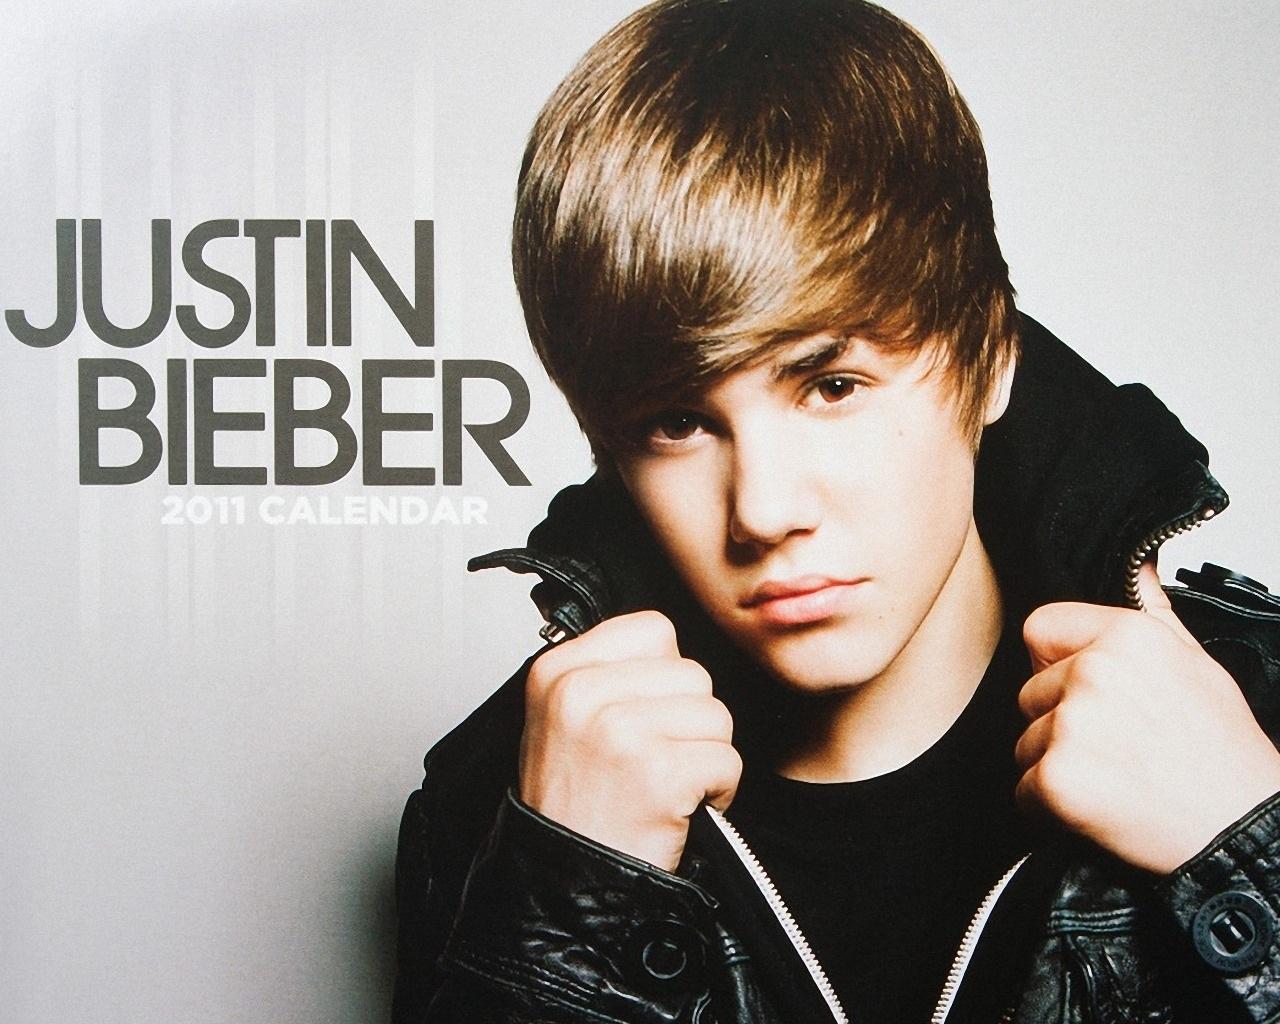 Imagenes de Justin Bieber